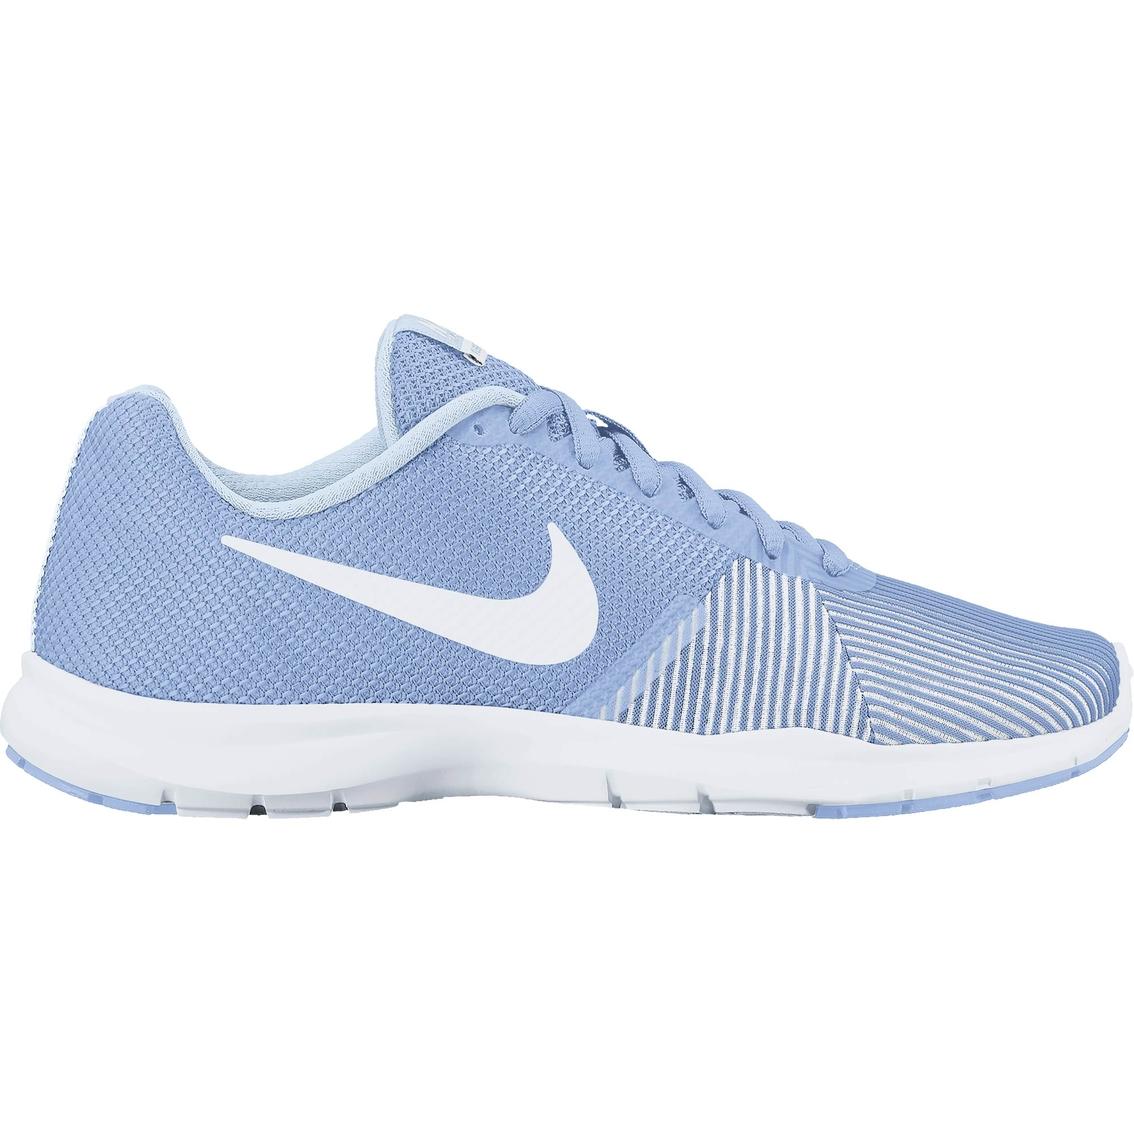 840b4e6a3f91 Nike Women s Flex Bijoux Training Shoes